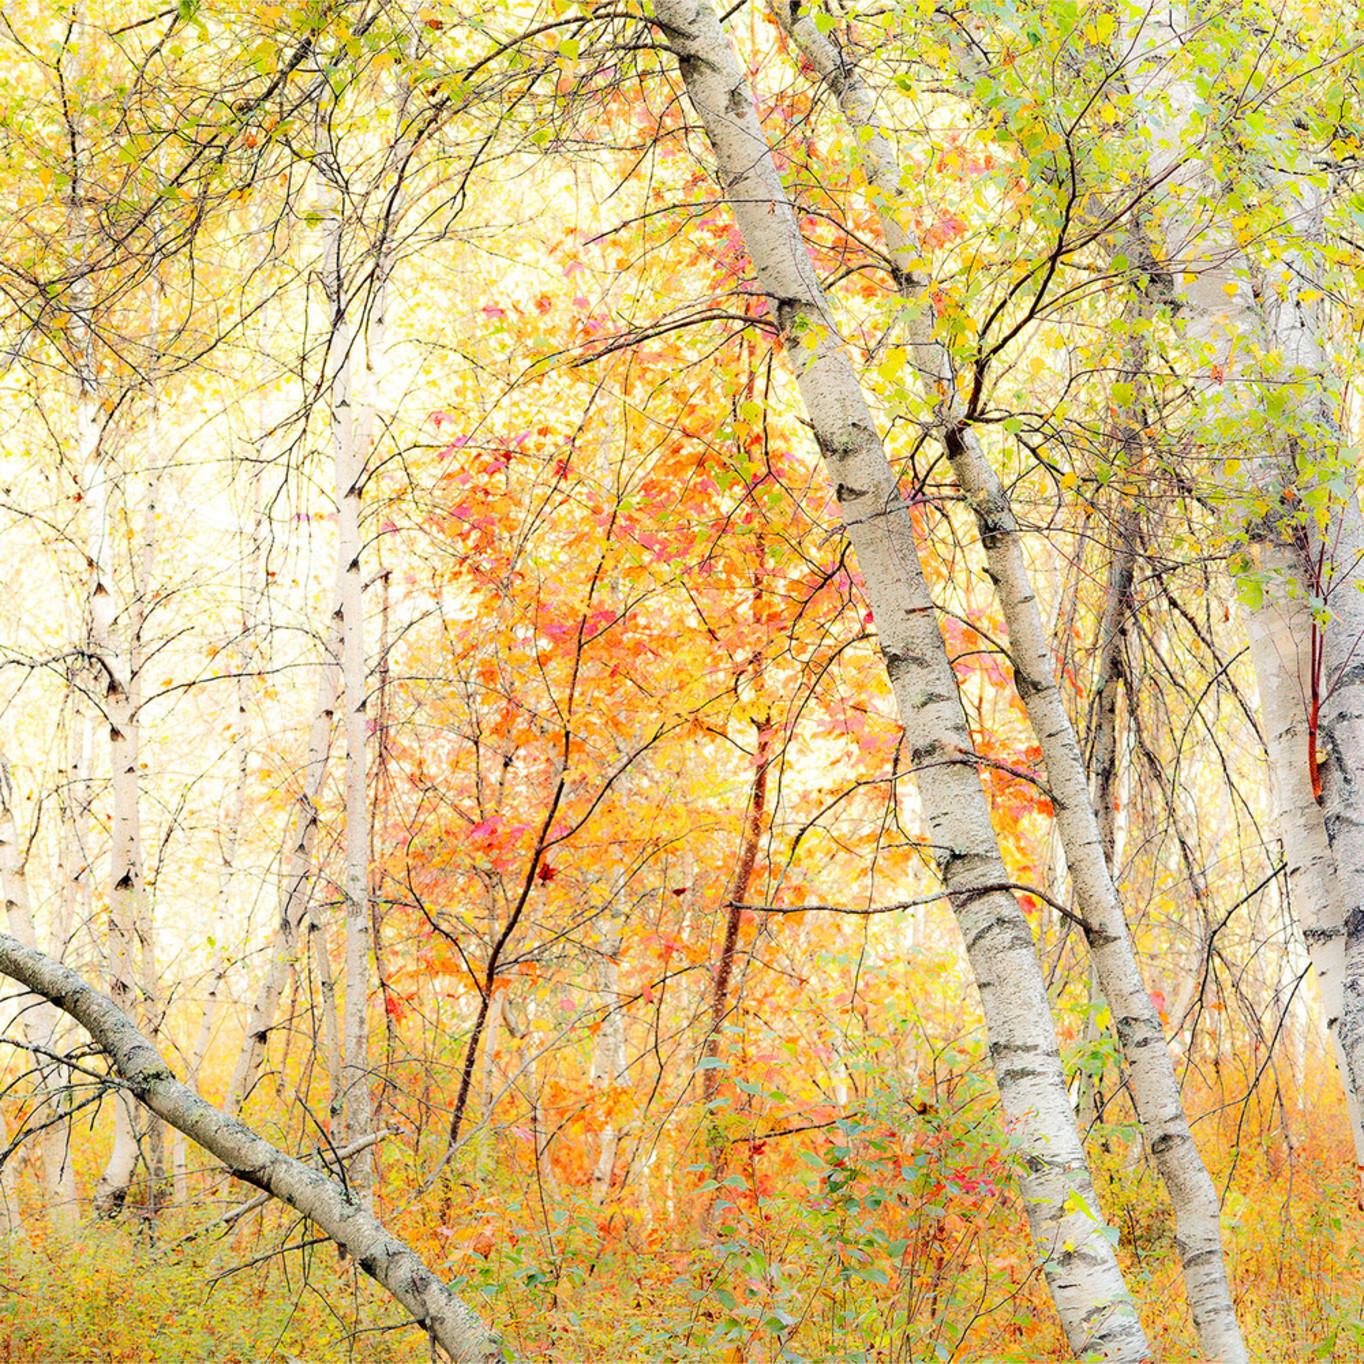 Autumnbrilliance whitebirch whtmnts 2015 10 05 0483 webopt vx3lcs